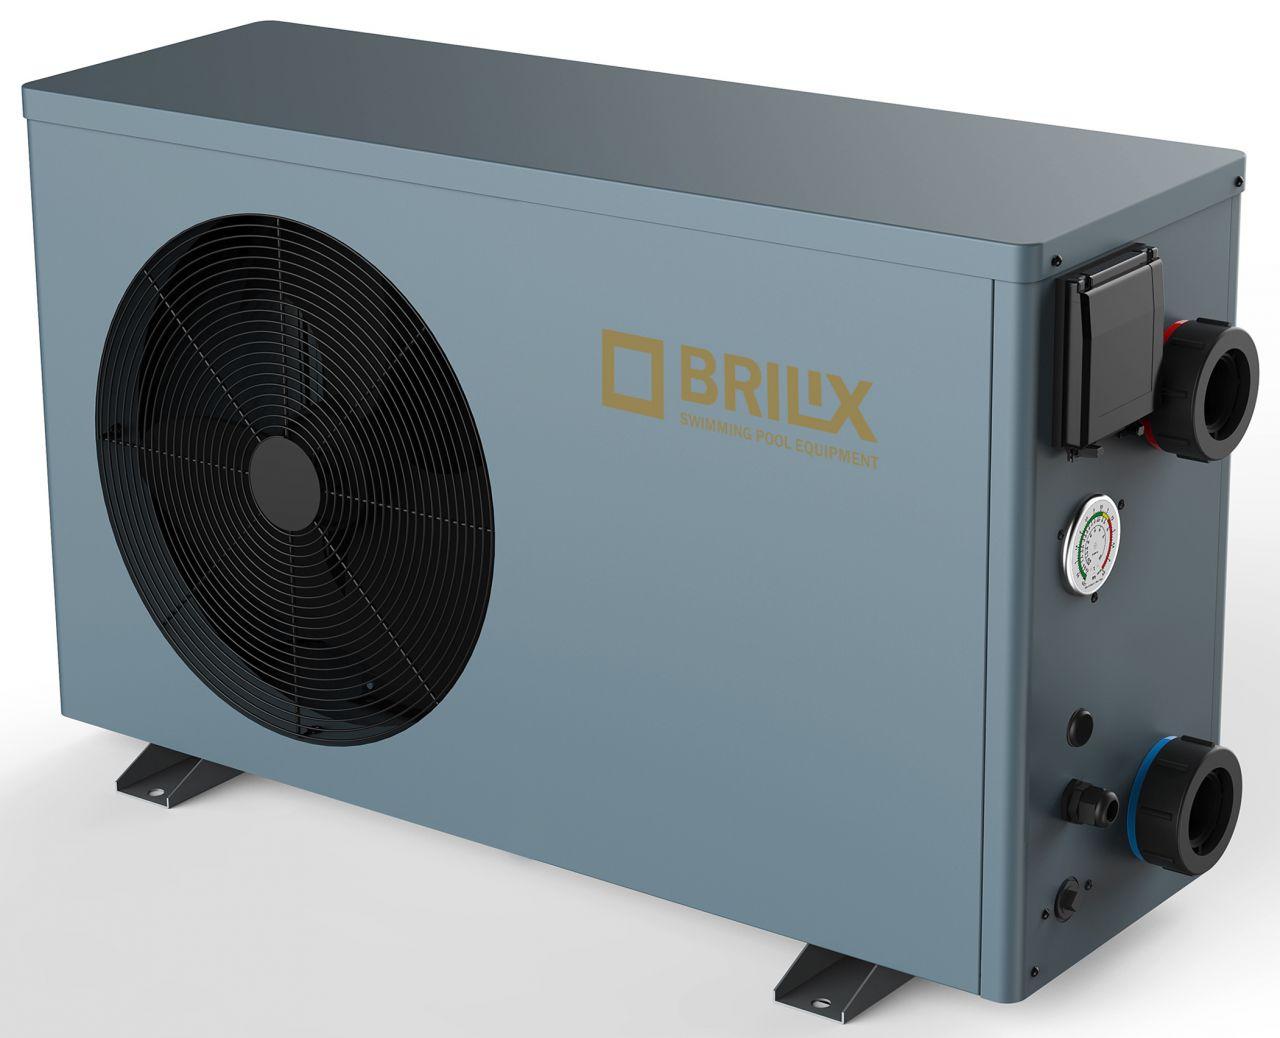 Brilix XHPFDPLUS Poolheizung Wärmepumpe